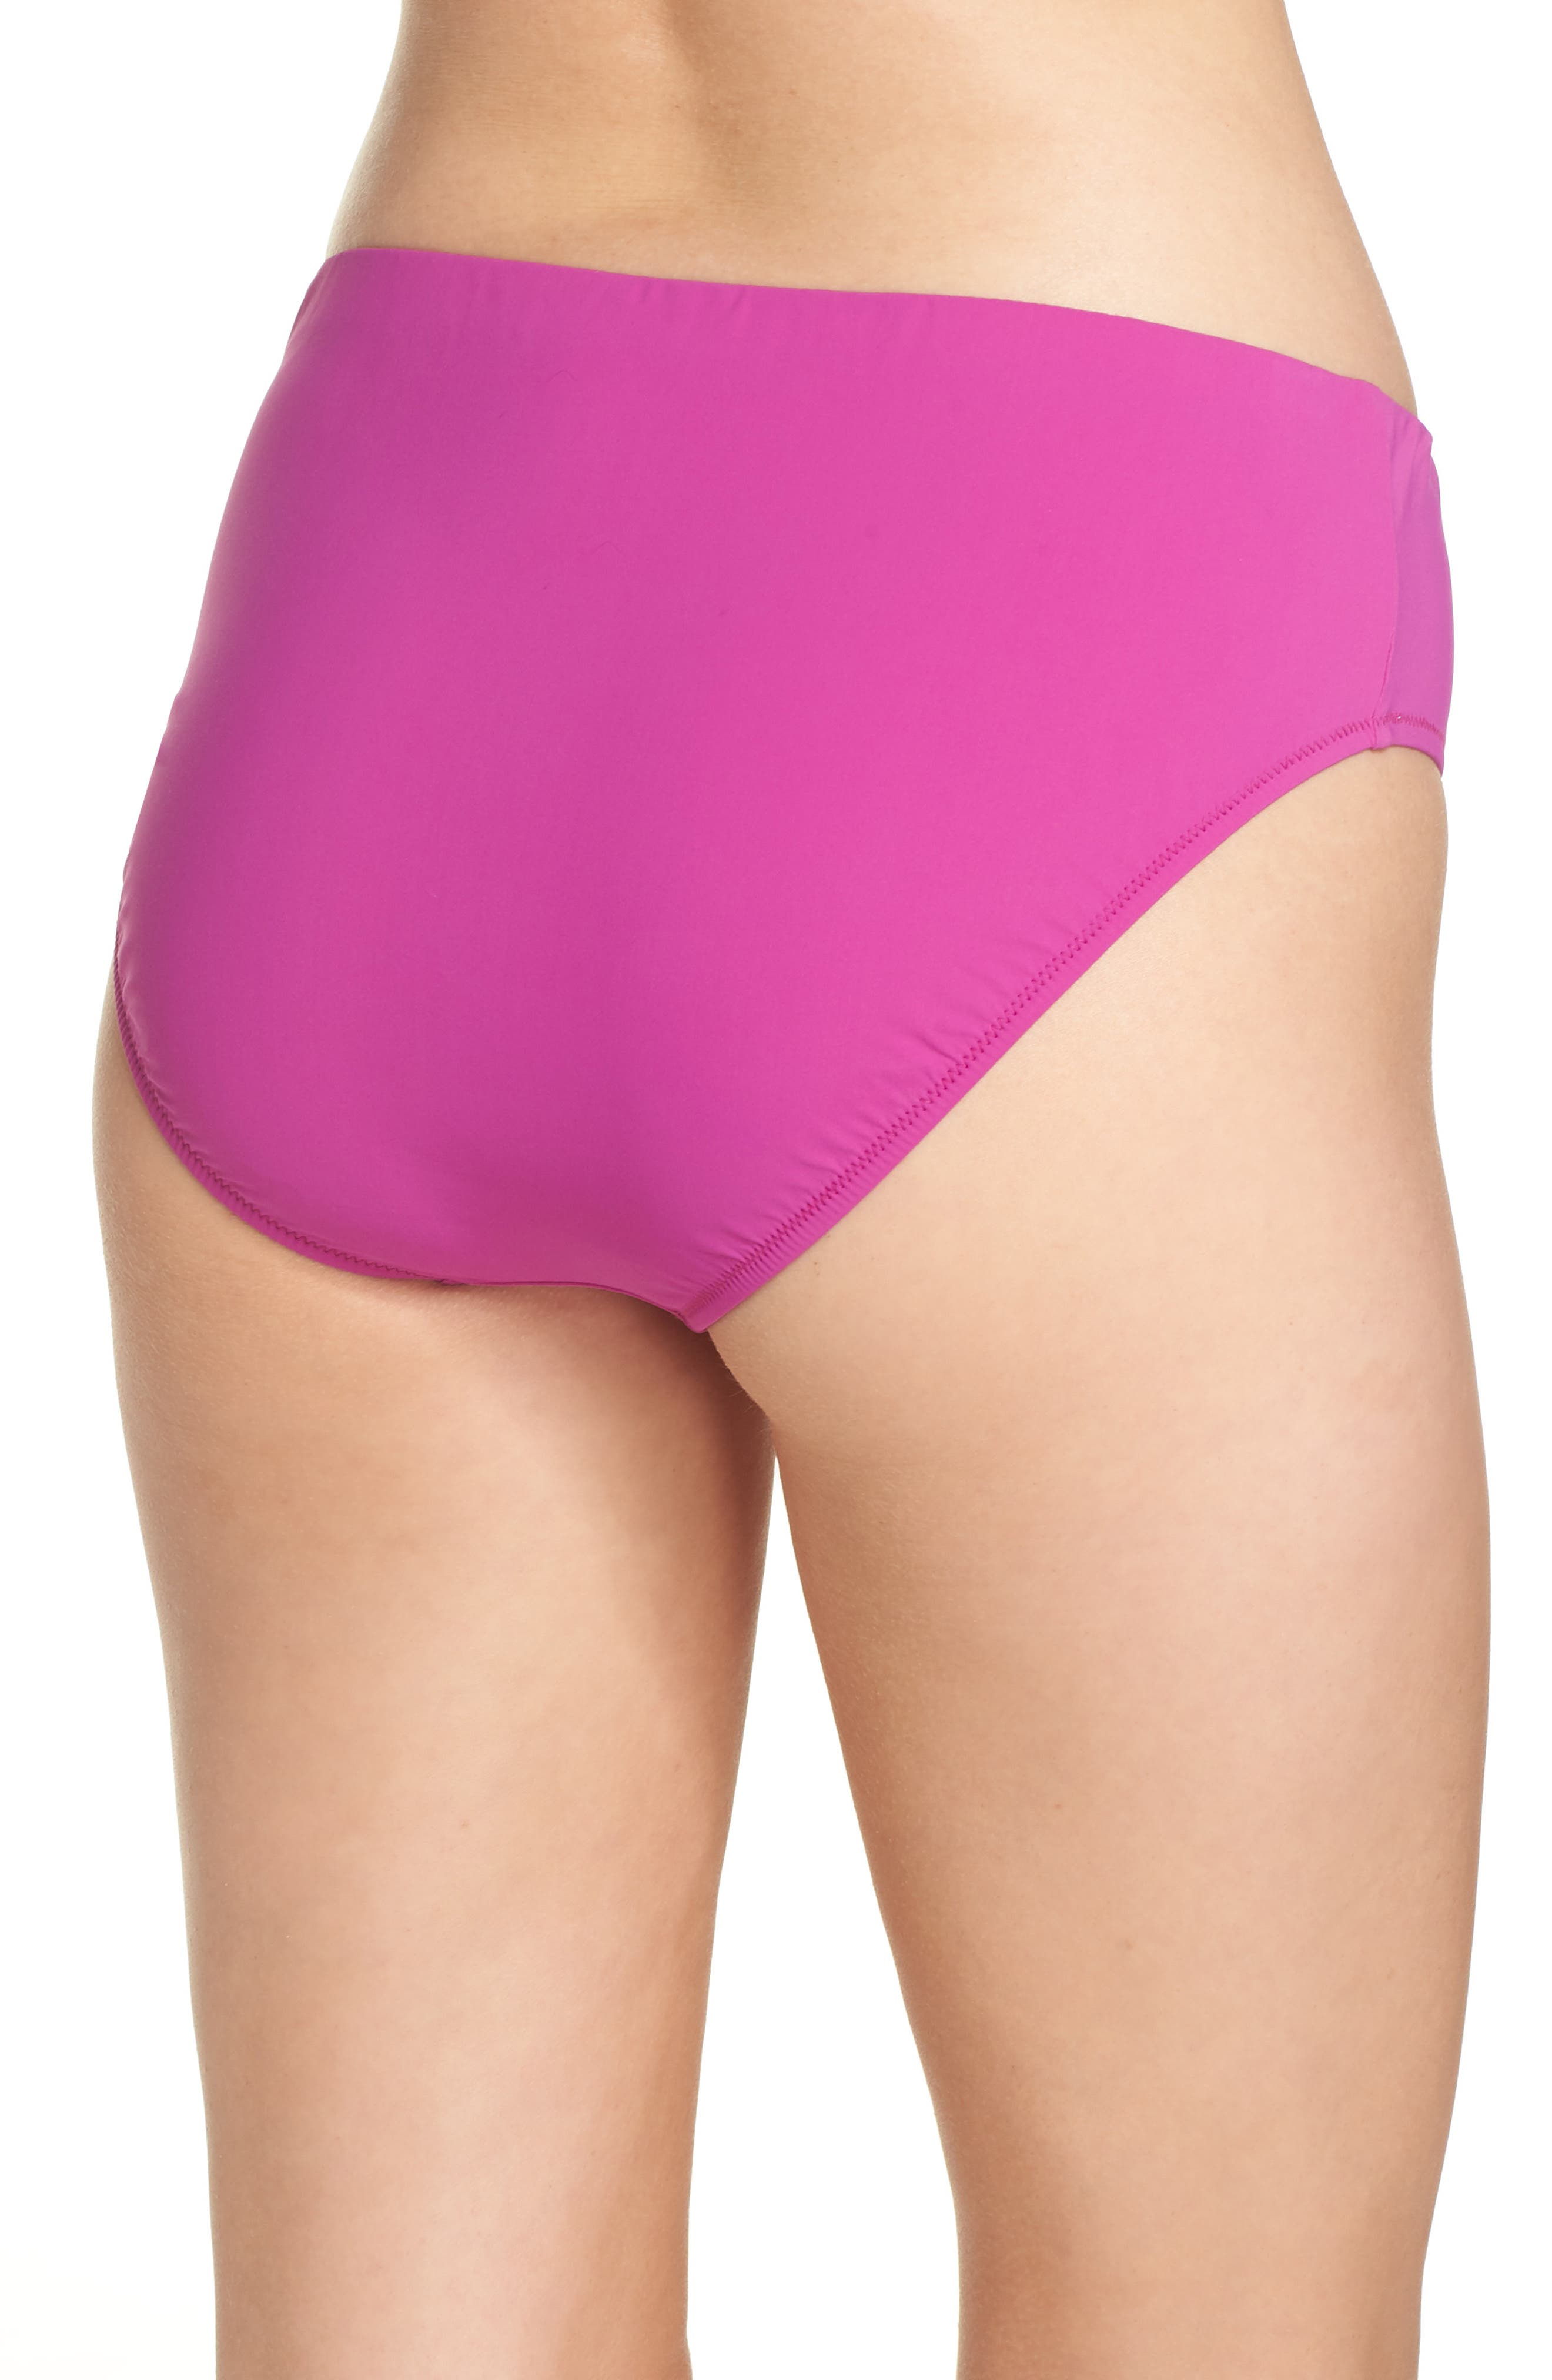 Bikini Bottoms,                             Alternate thumbnail 2, color,                             WARM VIOLA